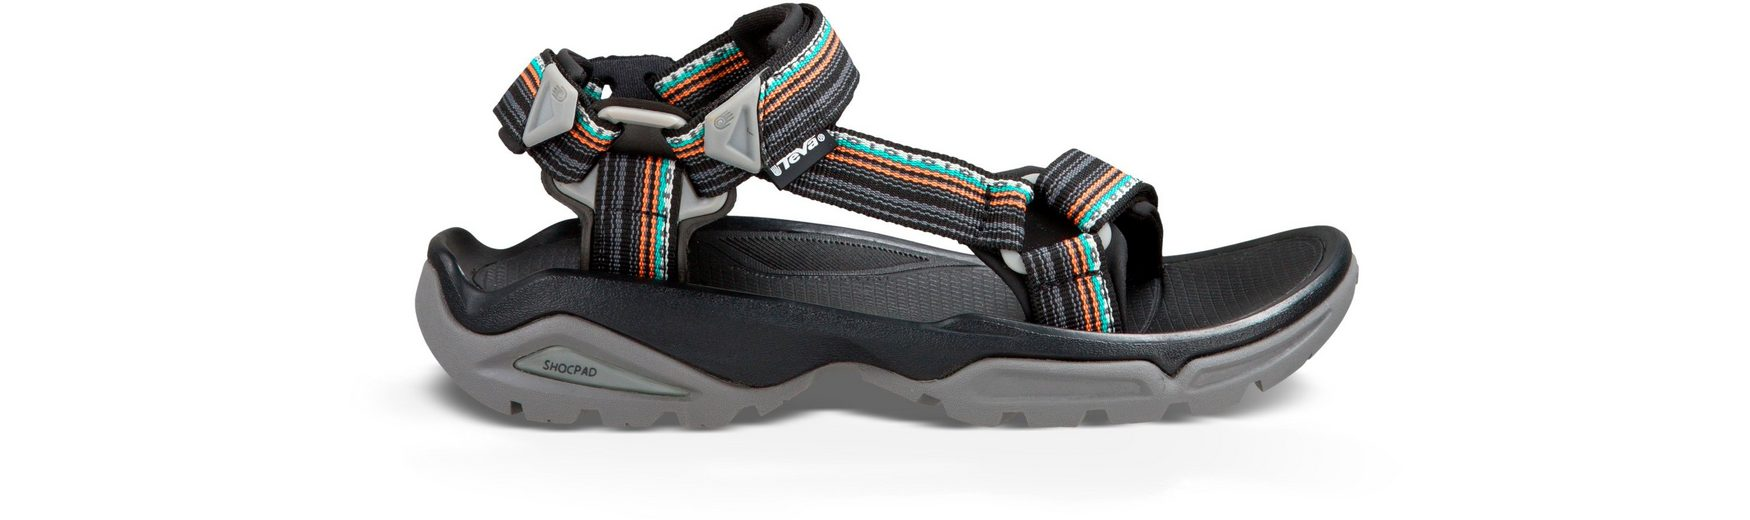 Steckdose Exklusive Teva Sandale Terra Fi 4 Sandals Women La Manta Black  Online-Verkauf Freies Verschiffen Verkauf Online Online Günstig Online fl9Bd